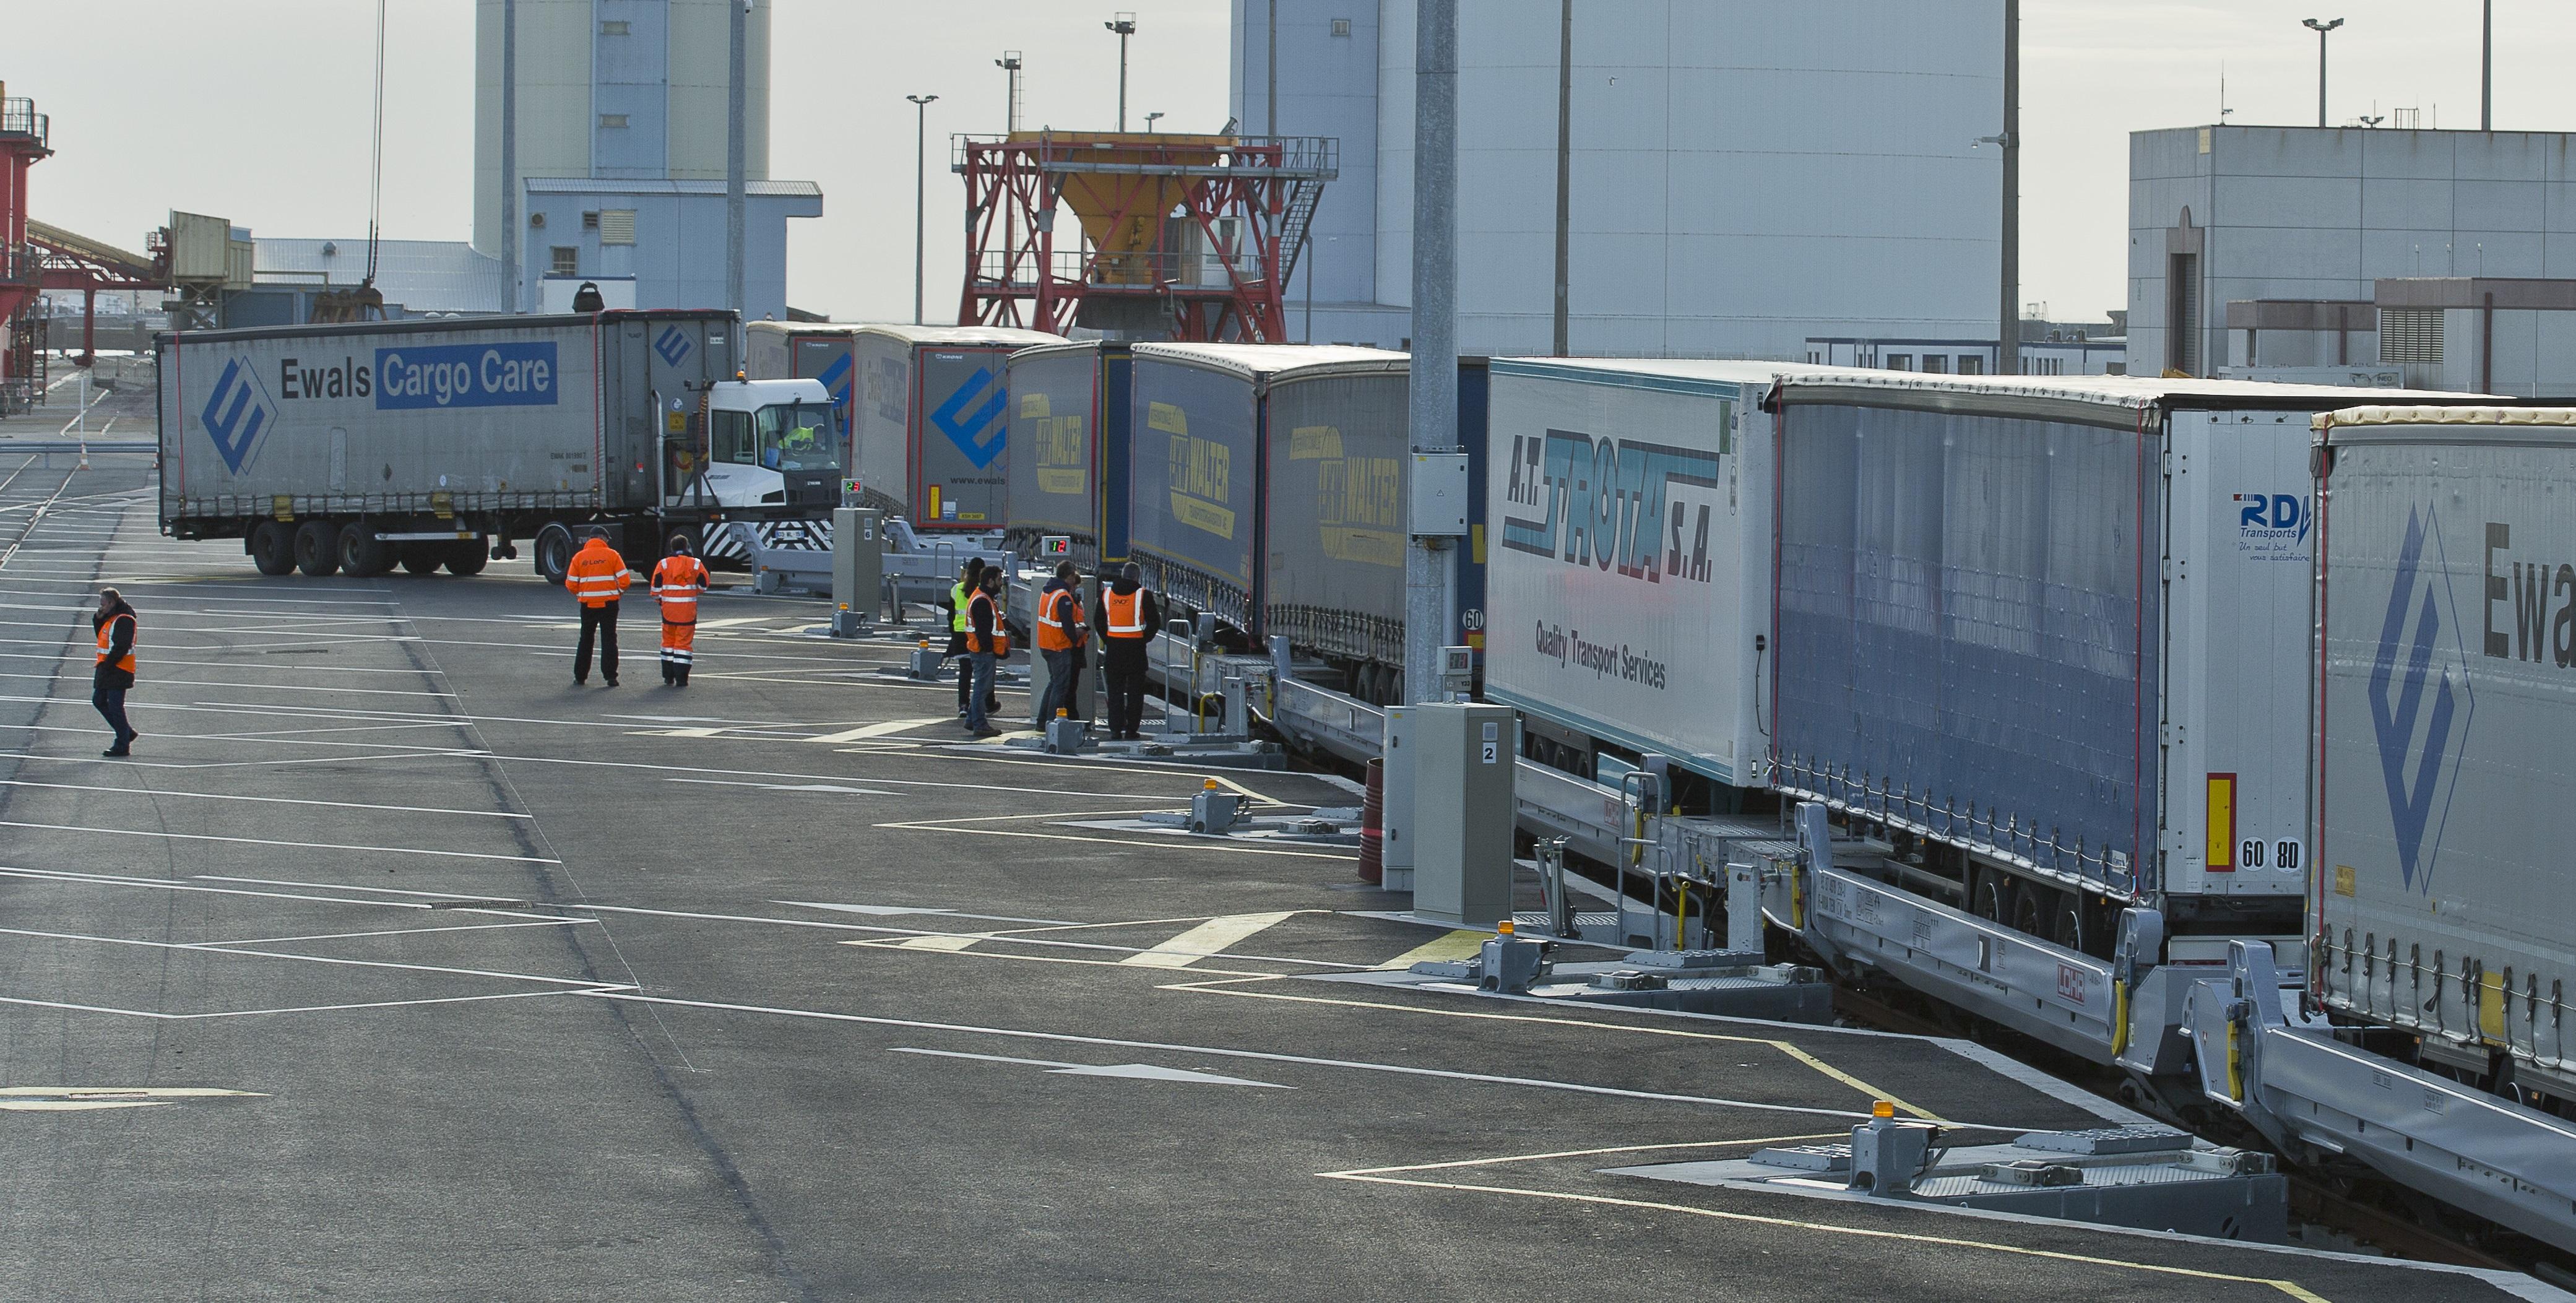 Loaded VIIA Britanica train in the port of Calais